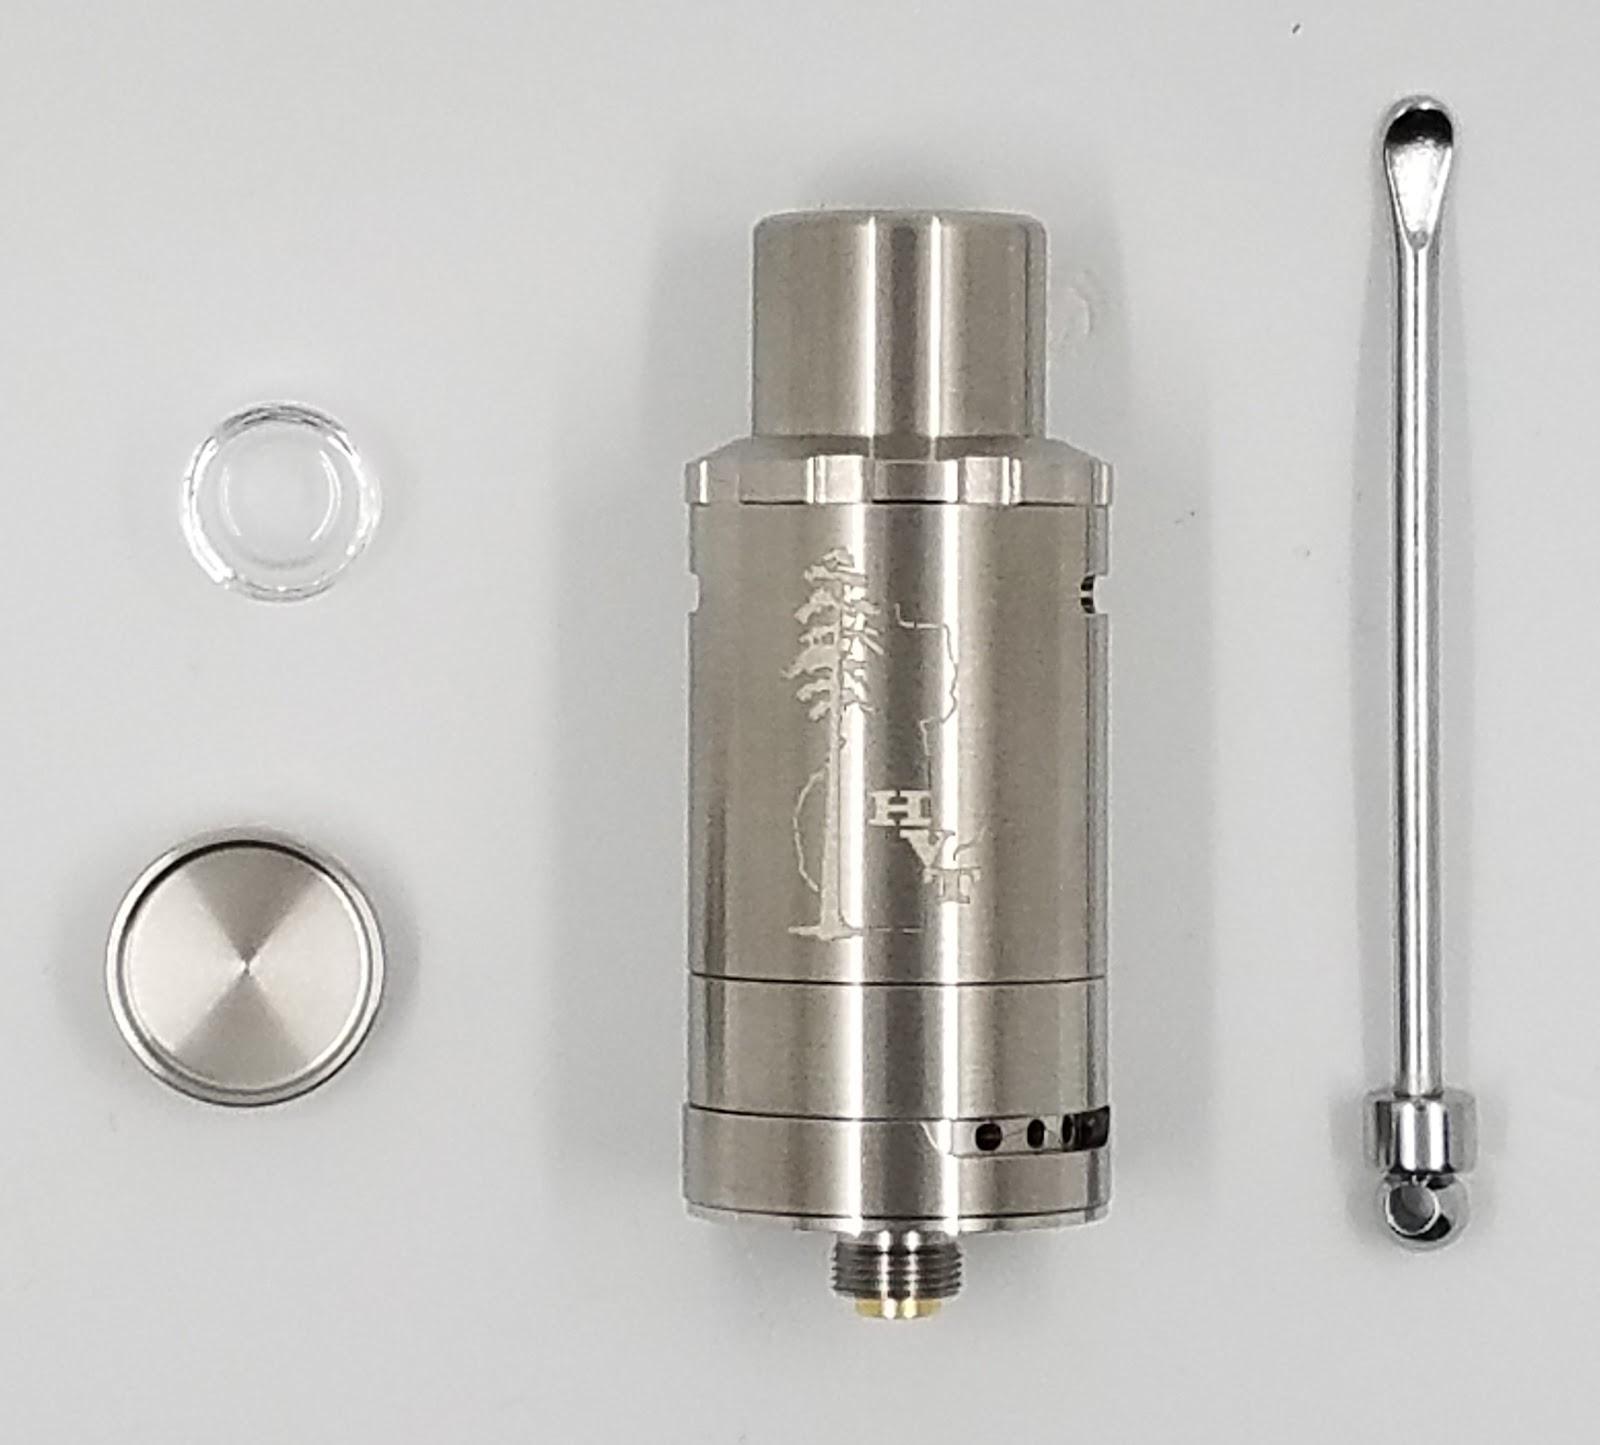 Cutting Edge Cannabis Product Spotlight: Saionara Vaporizer